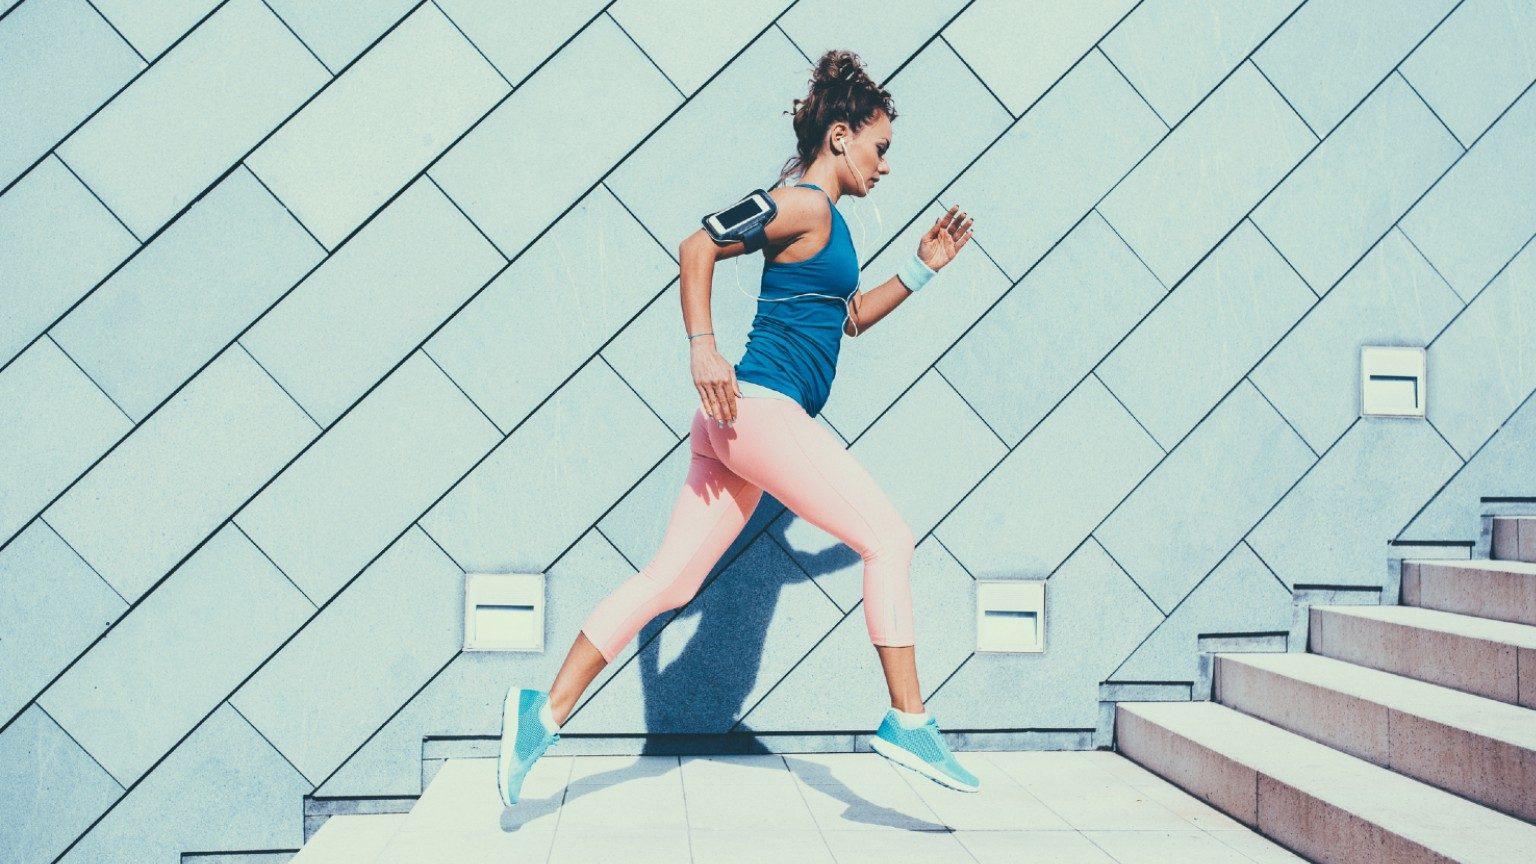 Sportswoman sports training